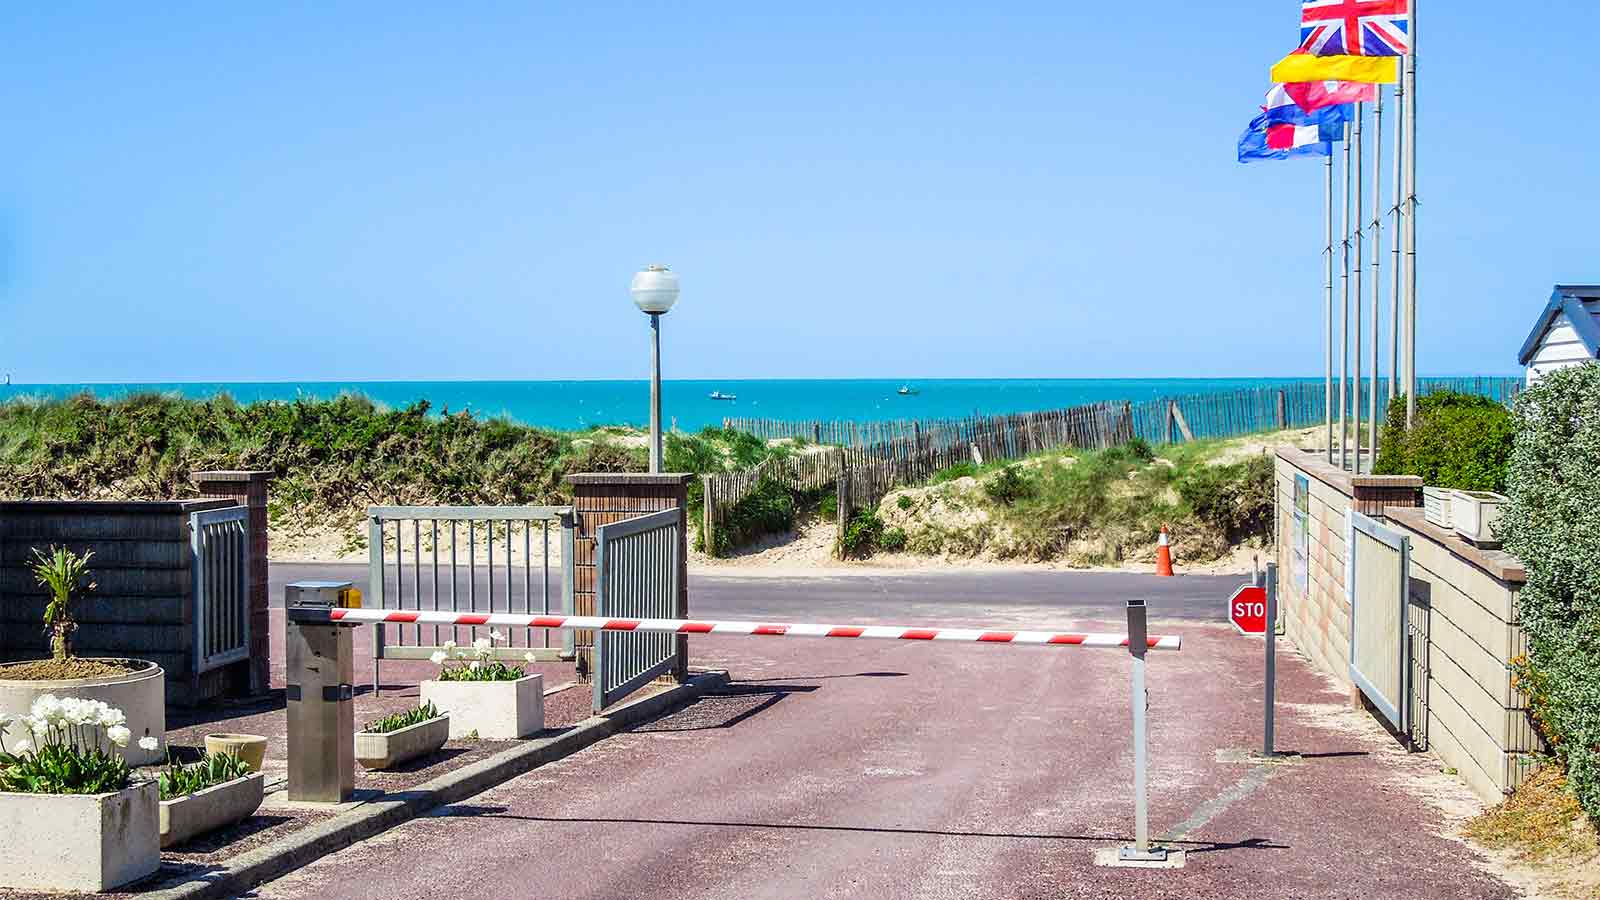 Camping manche gouville sur mer location vacances for Camping normandie bord de mer avec piscine